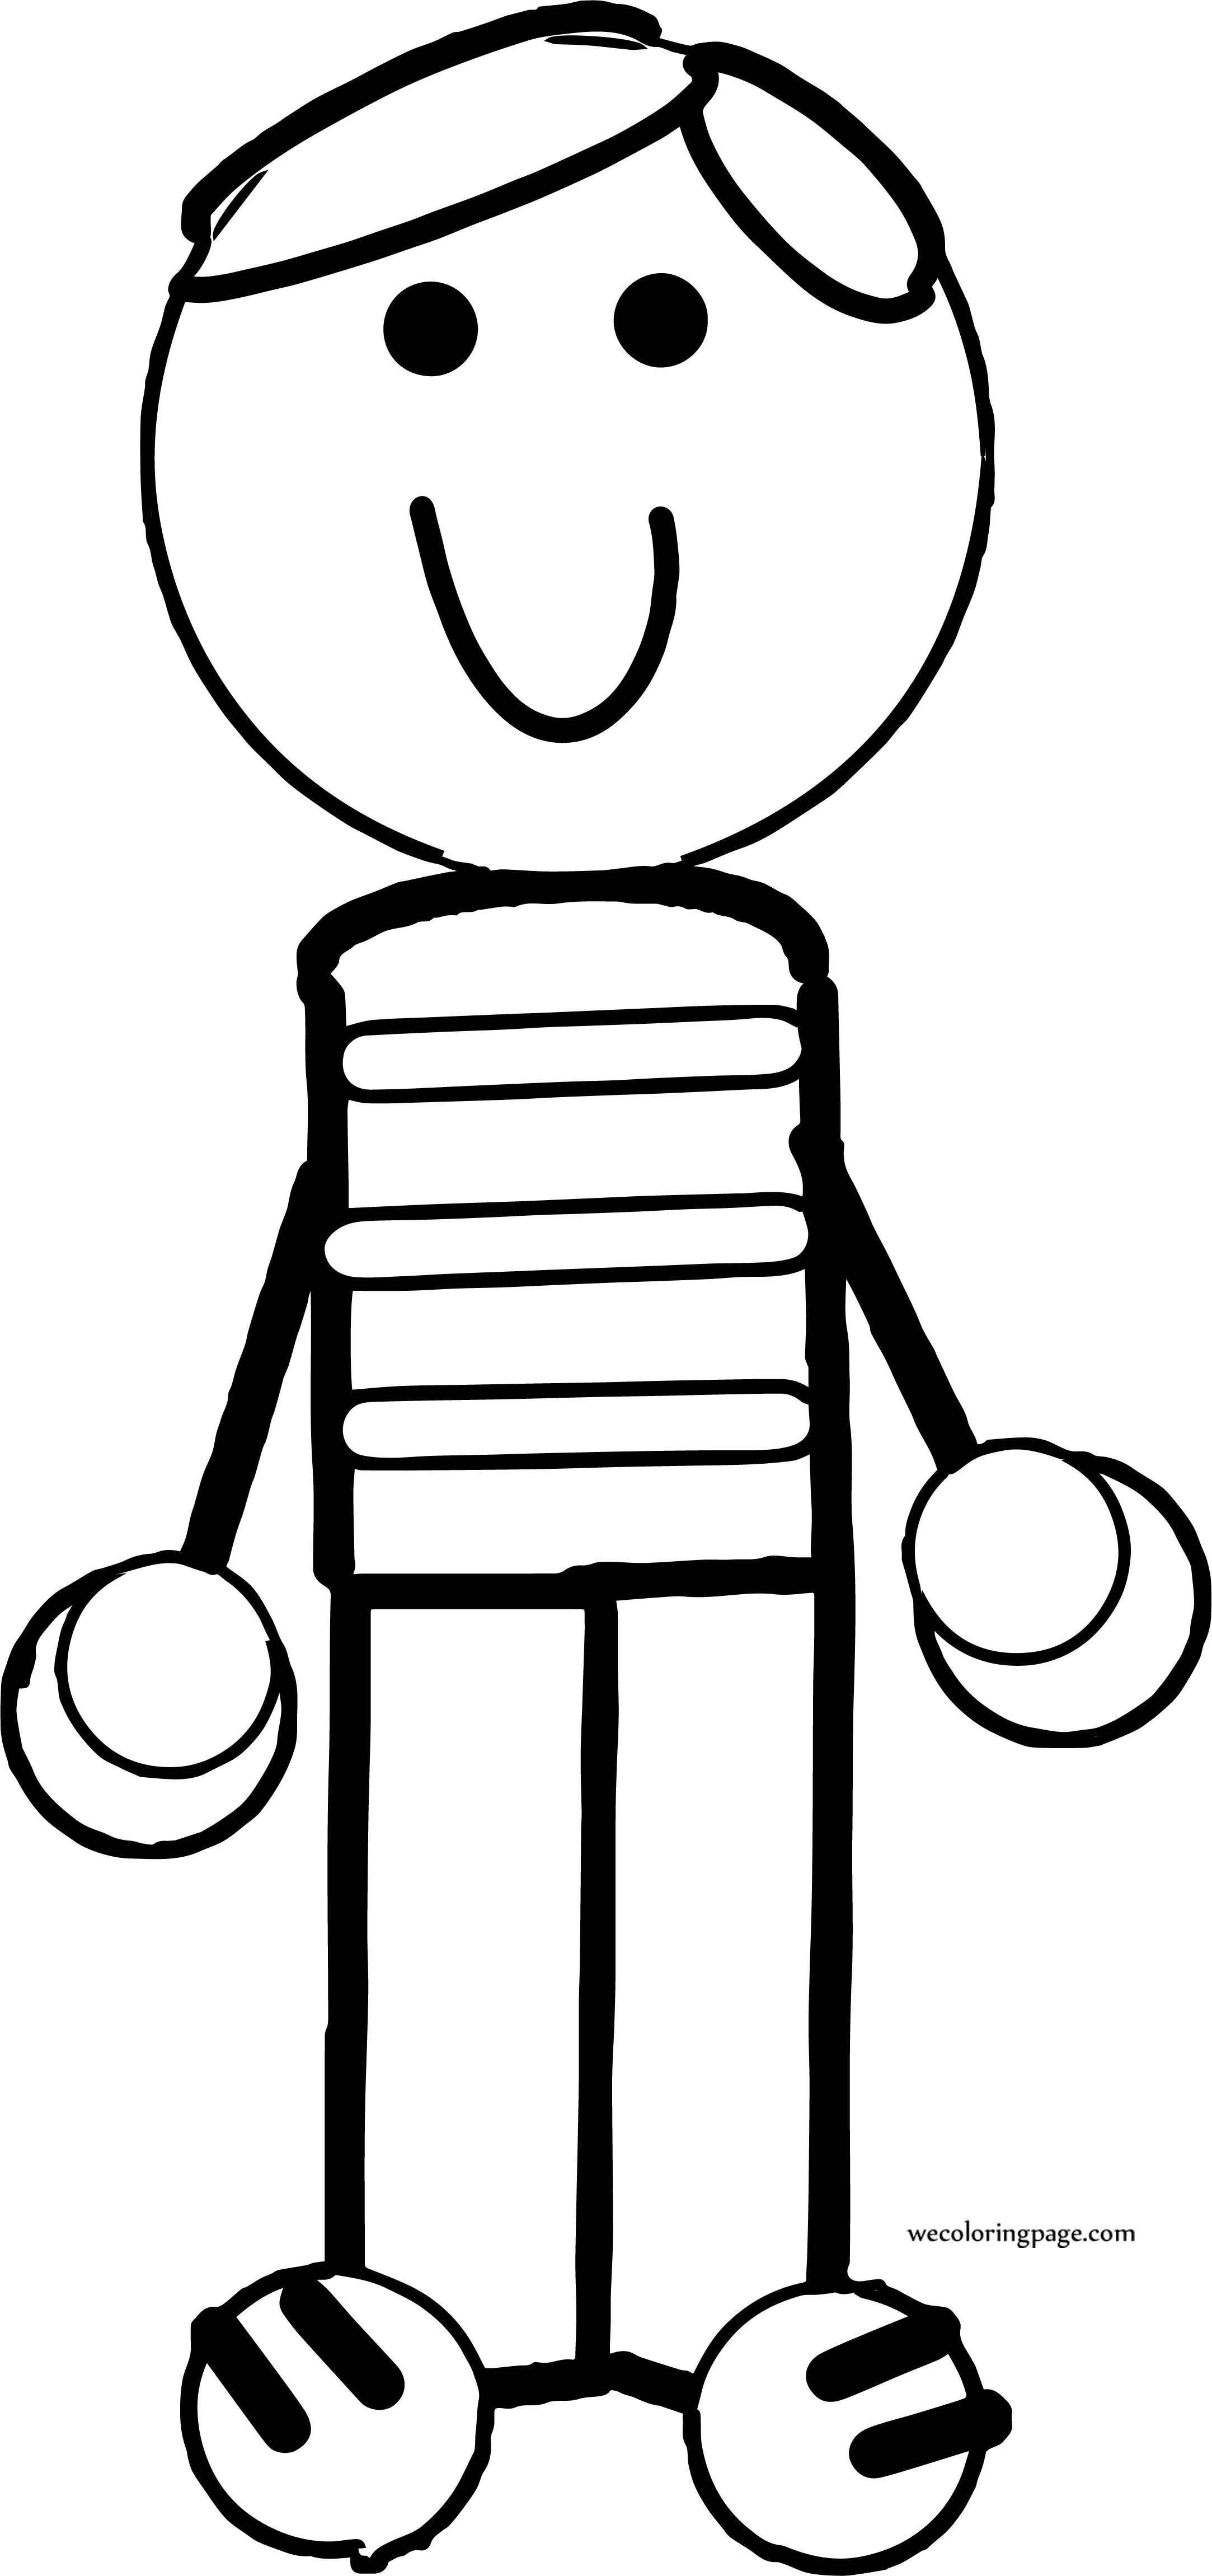 A Boy Coloring Page